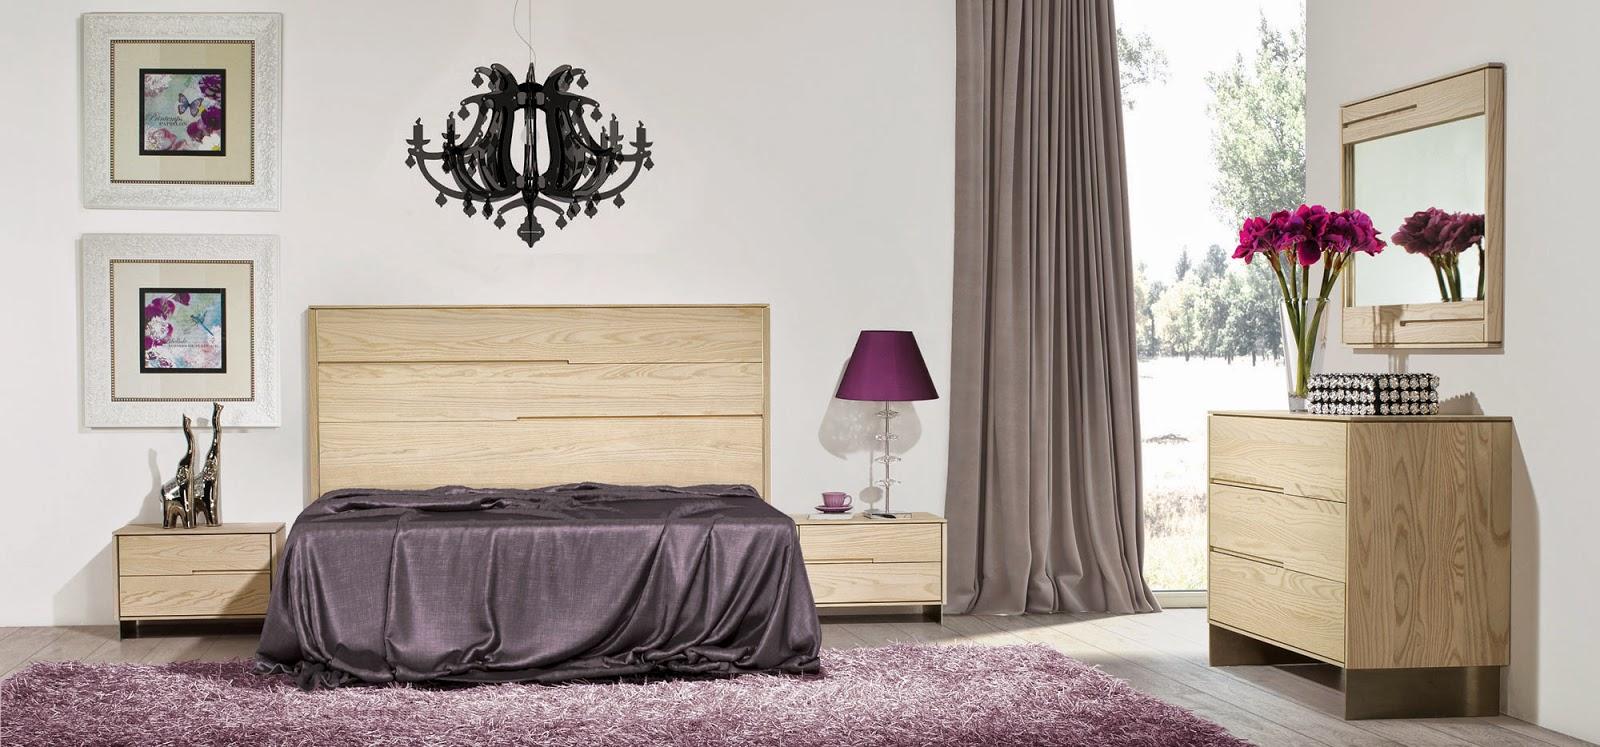 http://www.portobellostreet.es/mueble/40378/Dormitorio-nordico-Opale